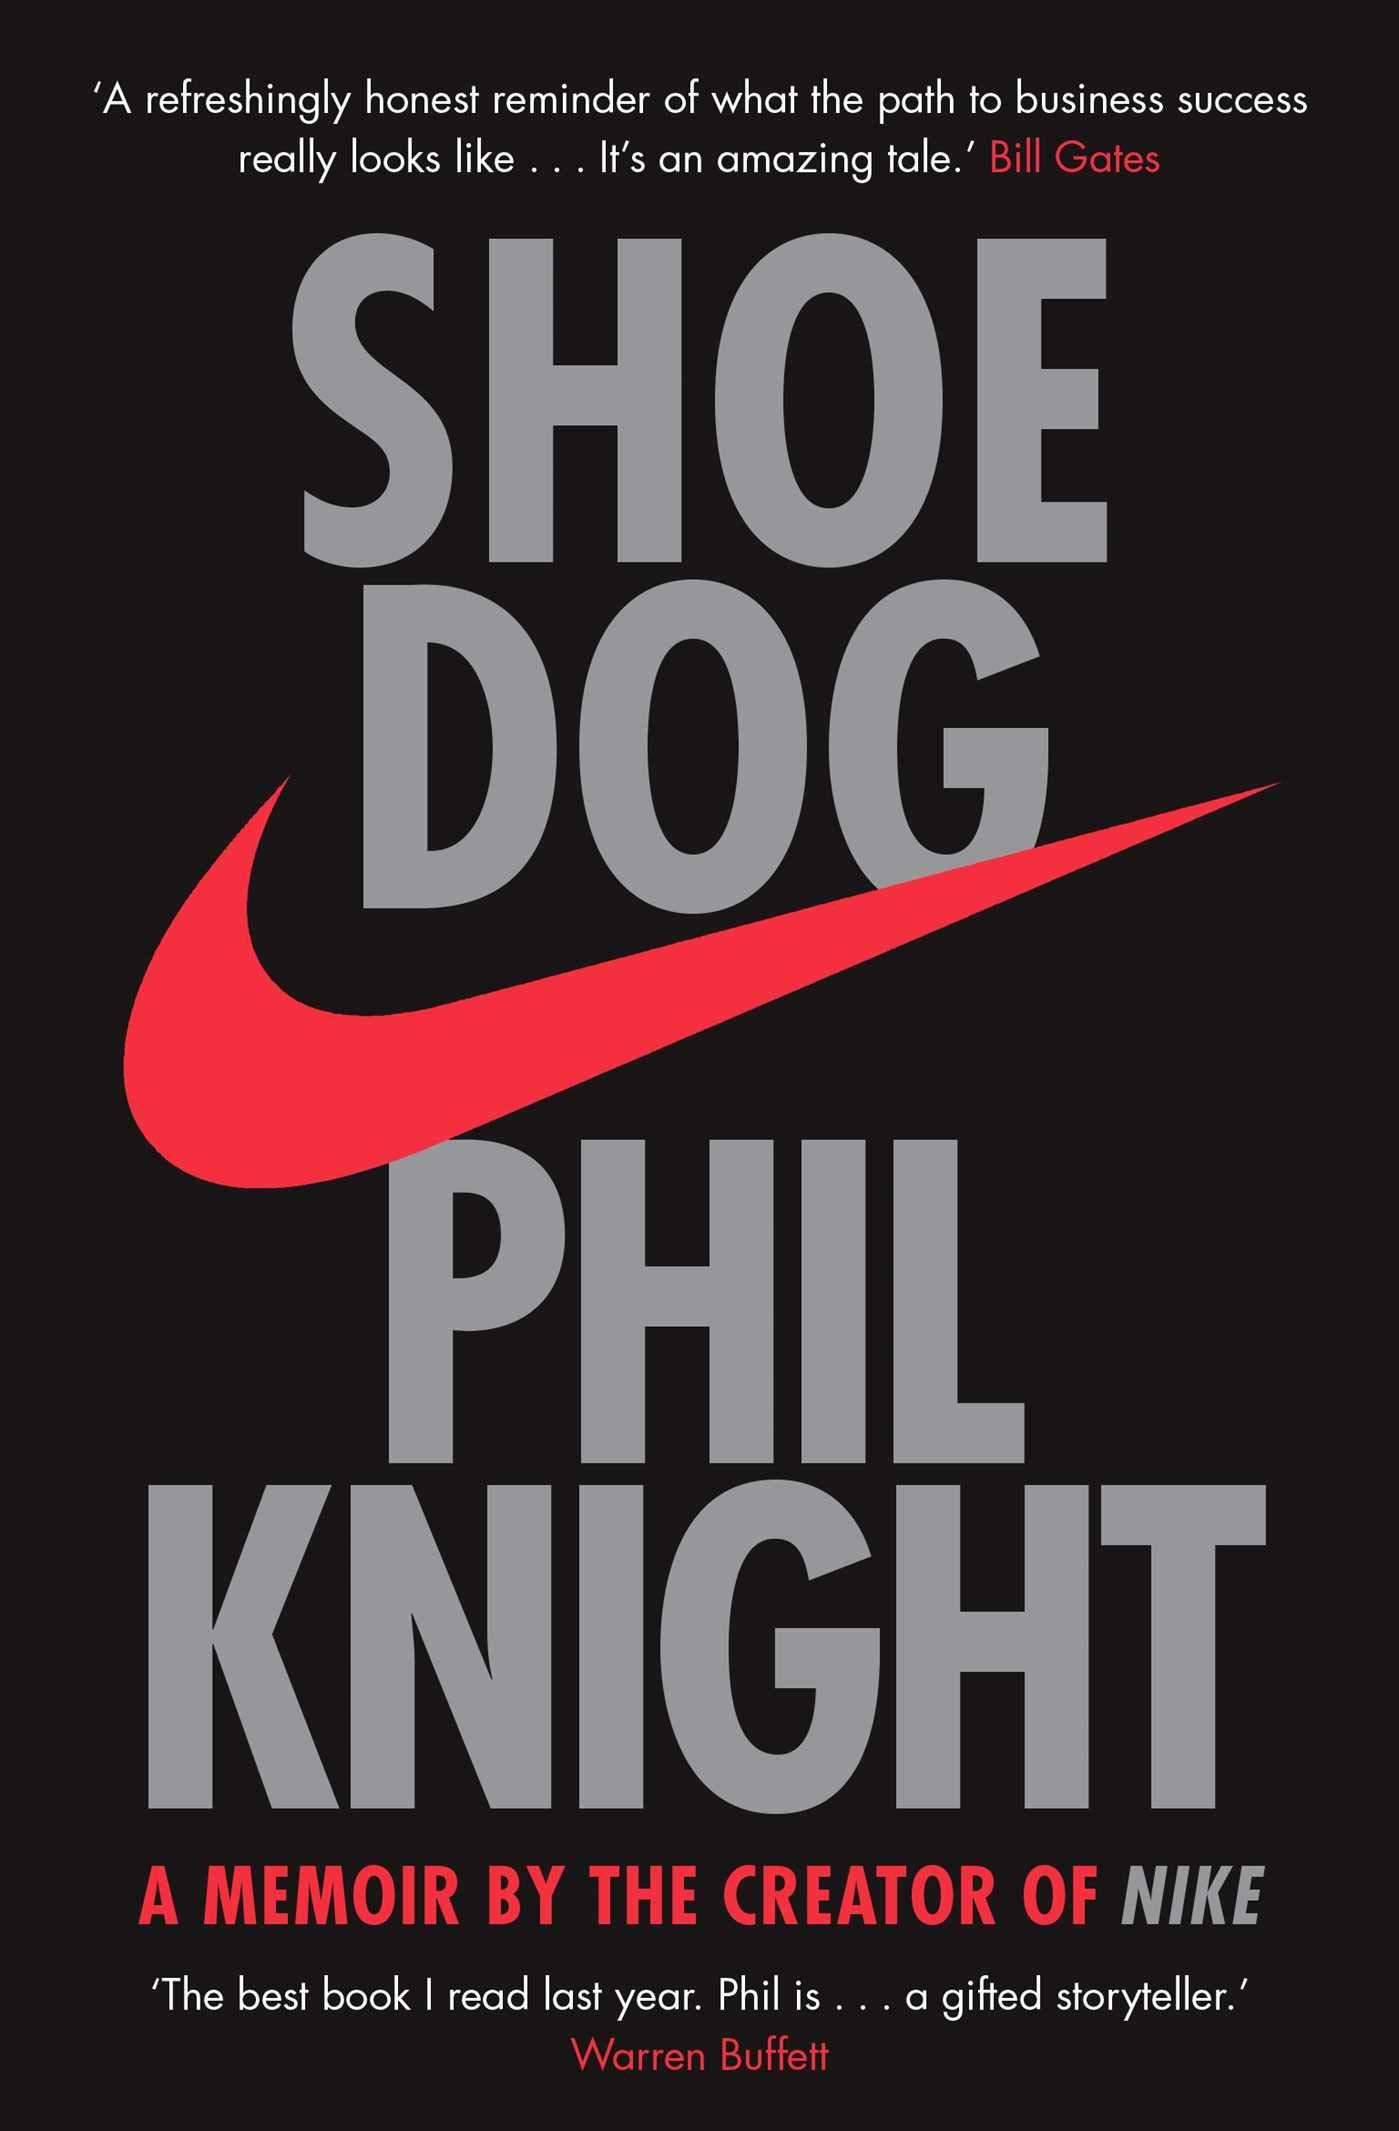 Phil Knight's memoir